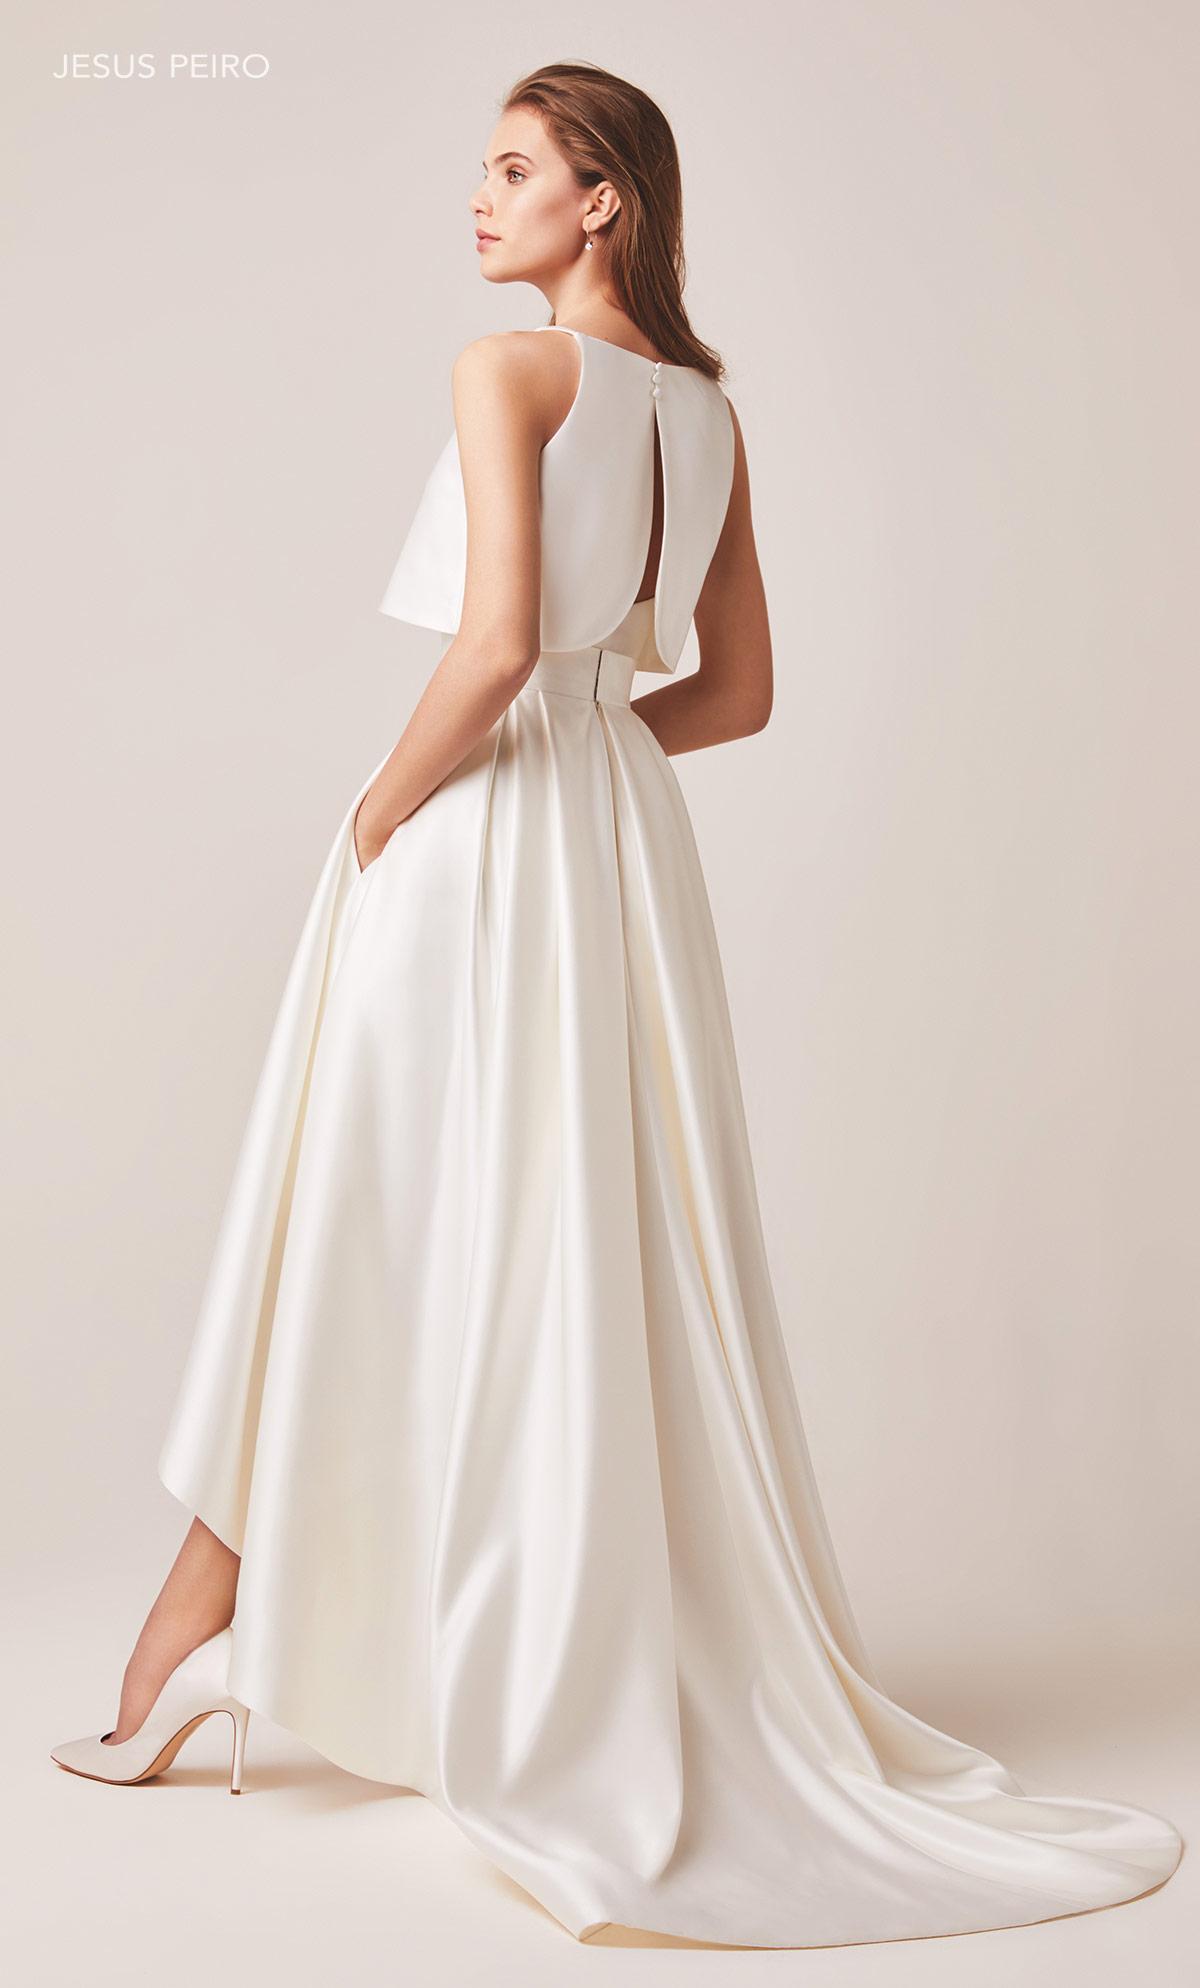 Vestido novia Jesús Peiró Ref.140